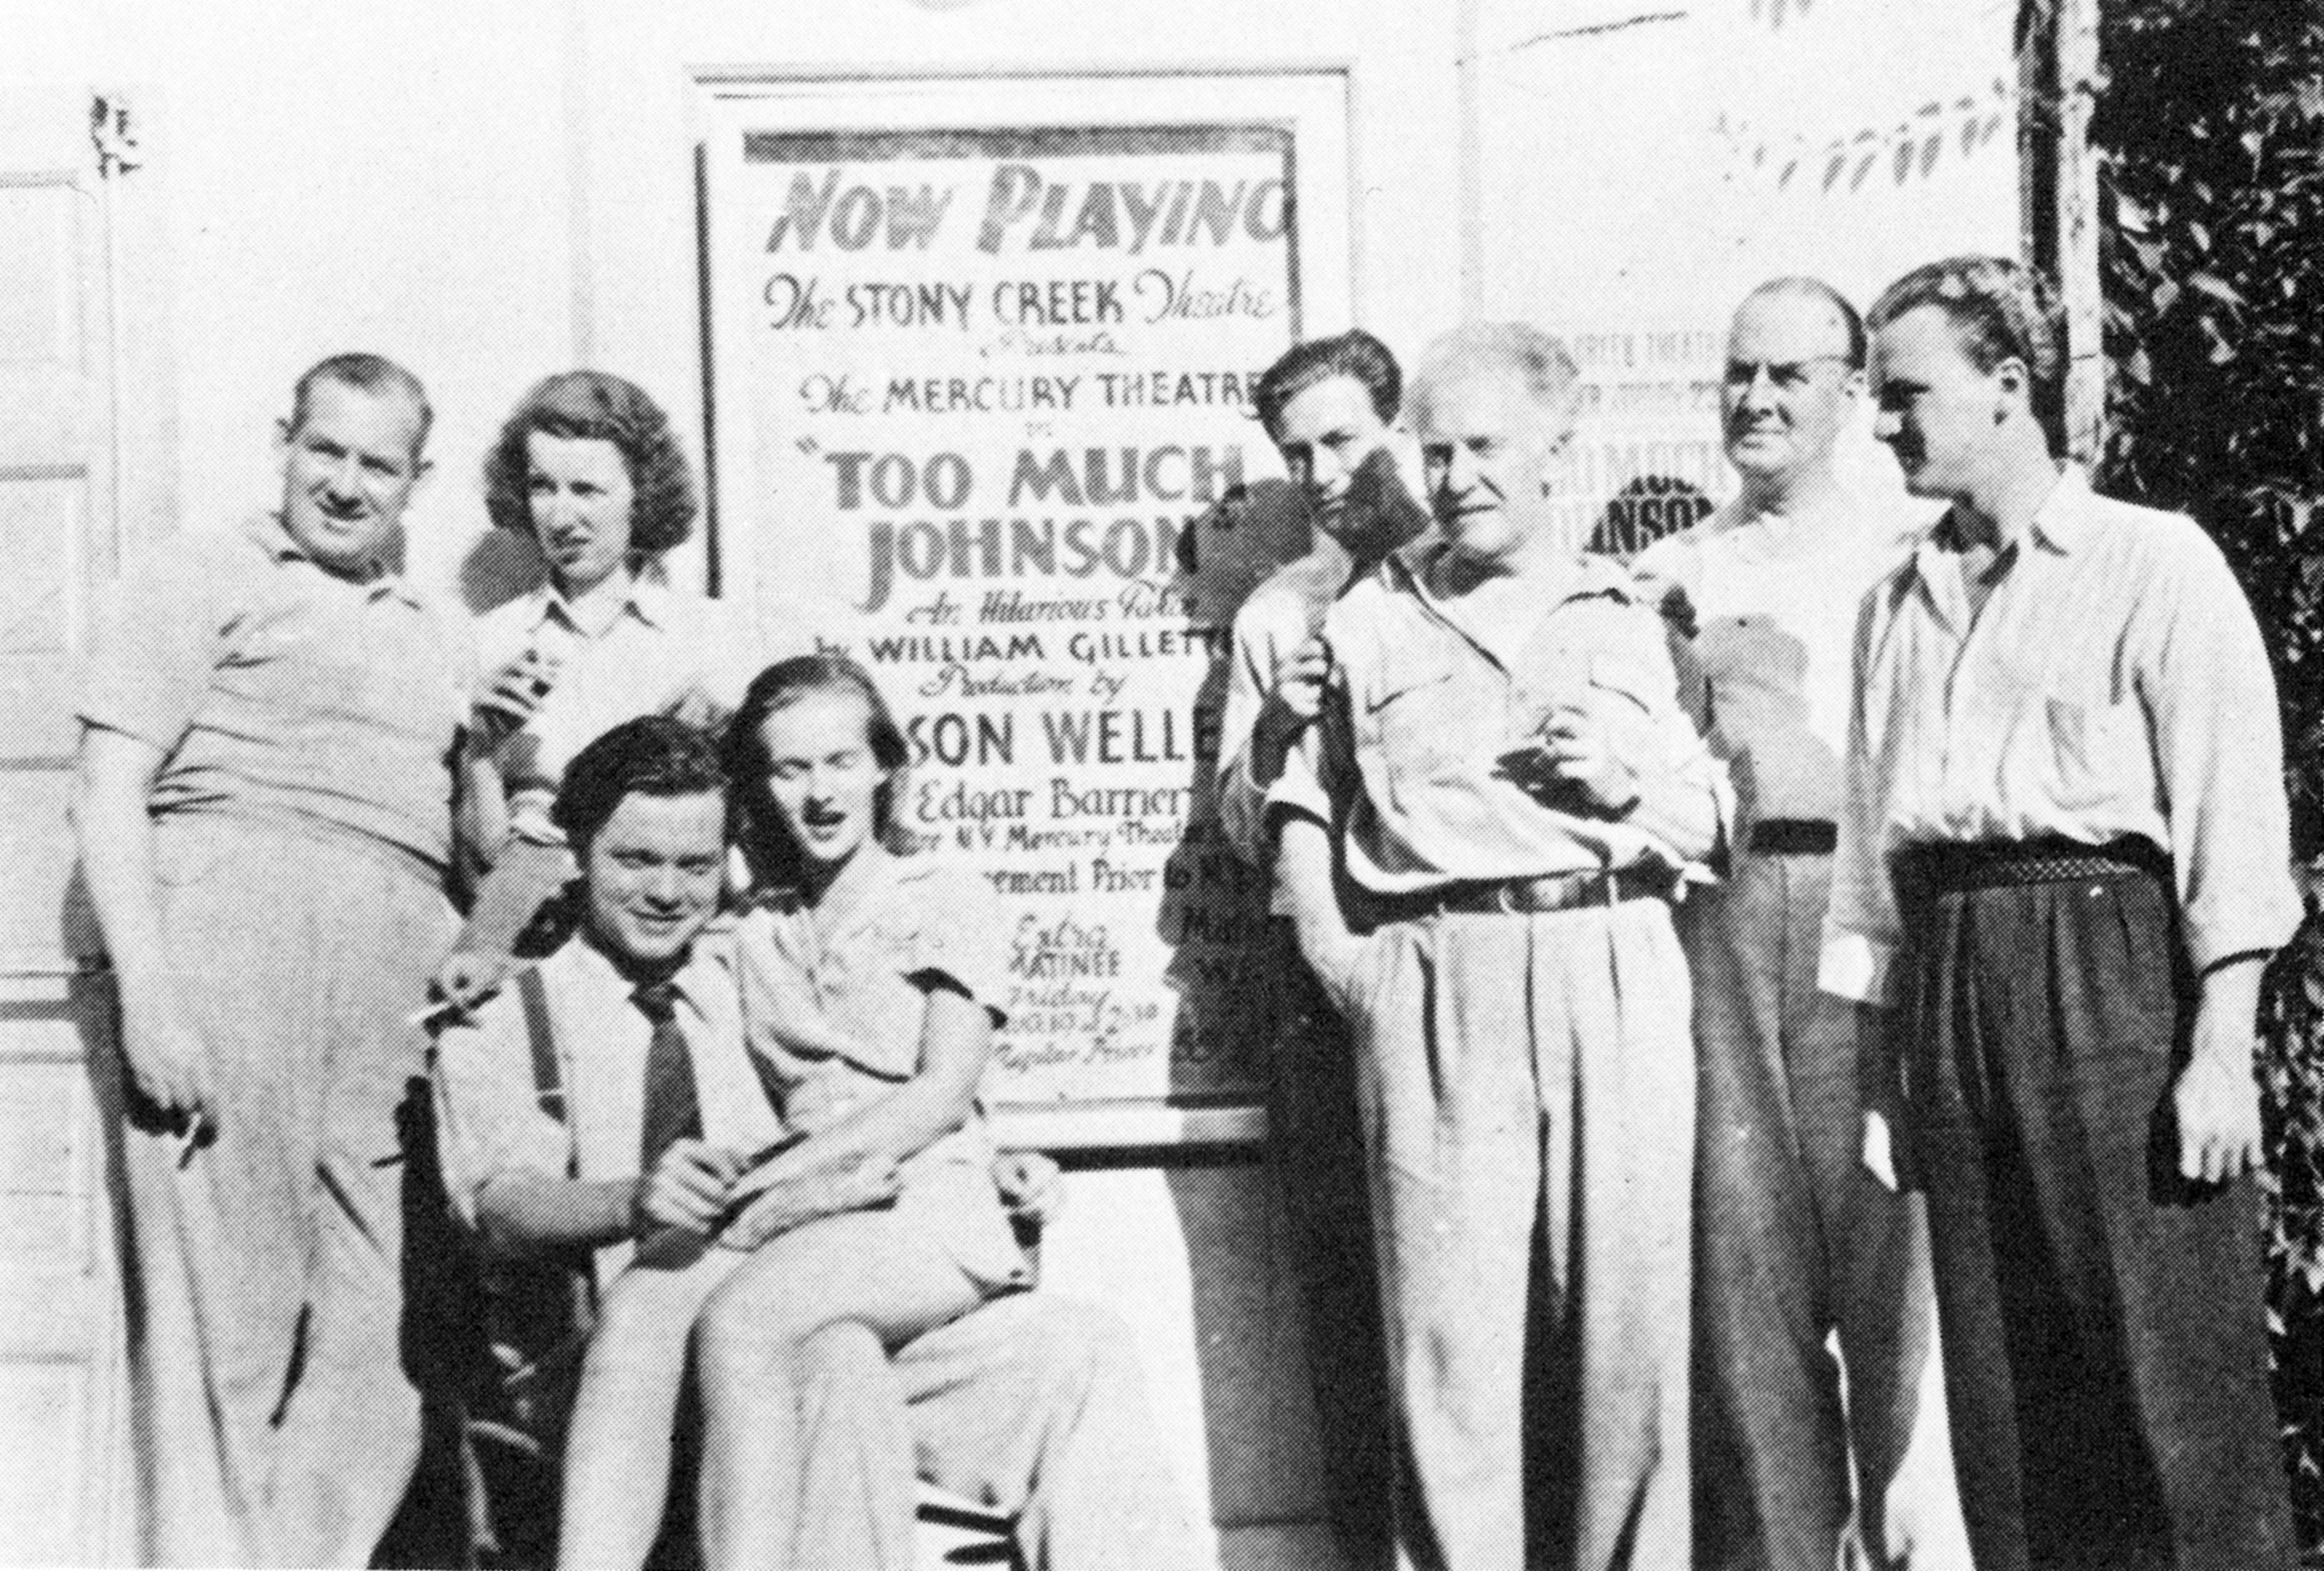 Файл:Too-Much-Johnson-Theatre-1938.jpg